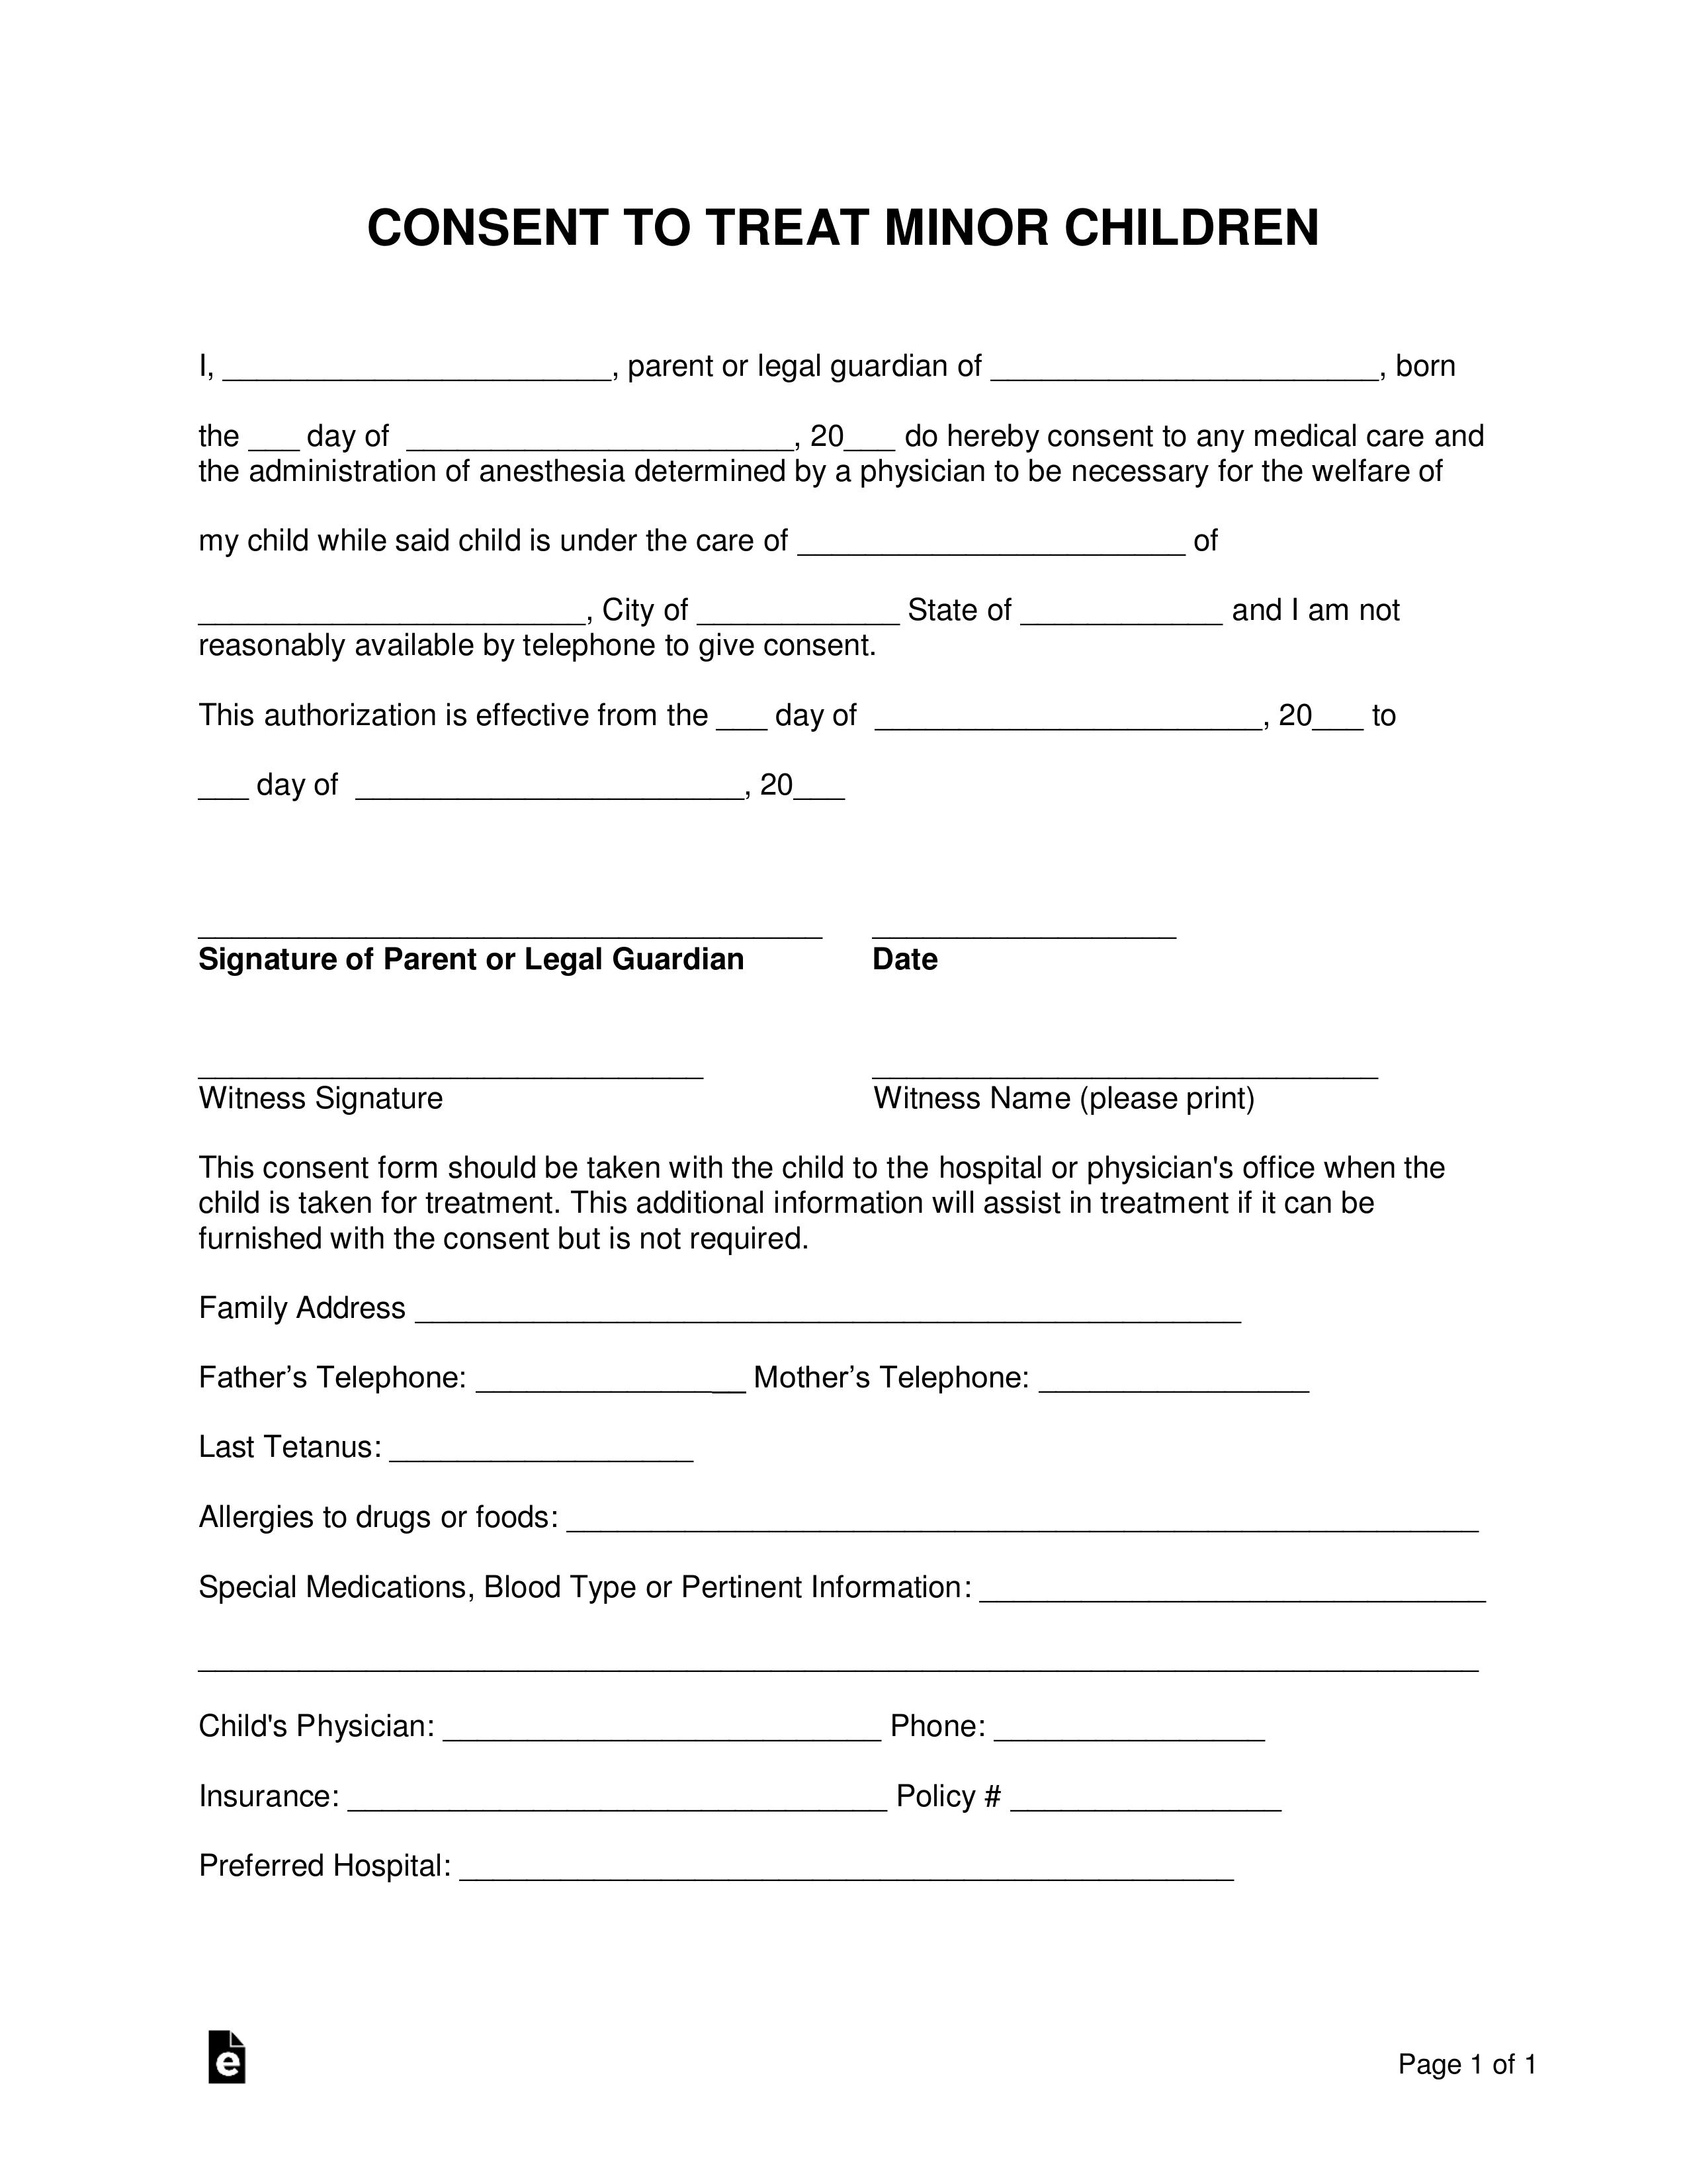 Child Care Authorization Form